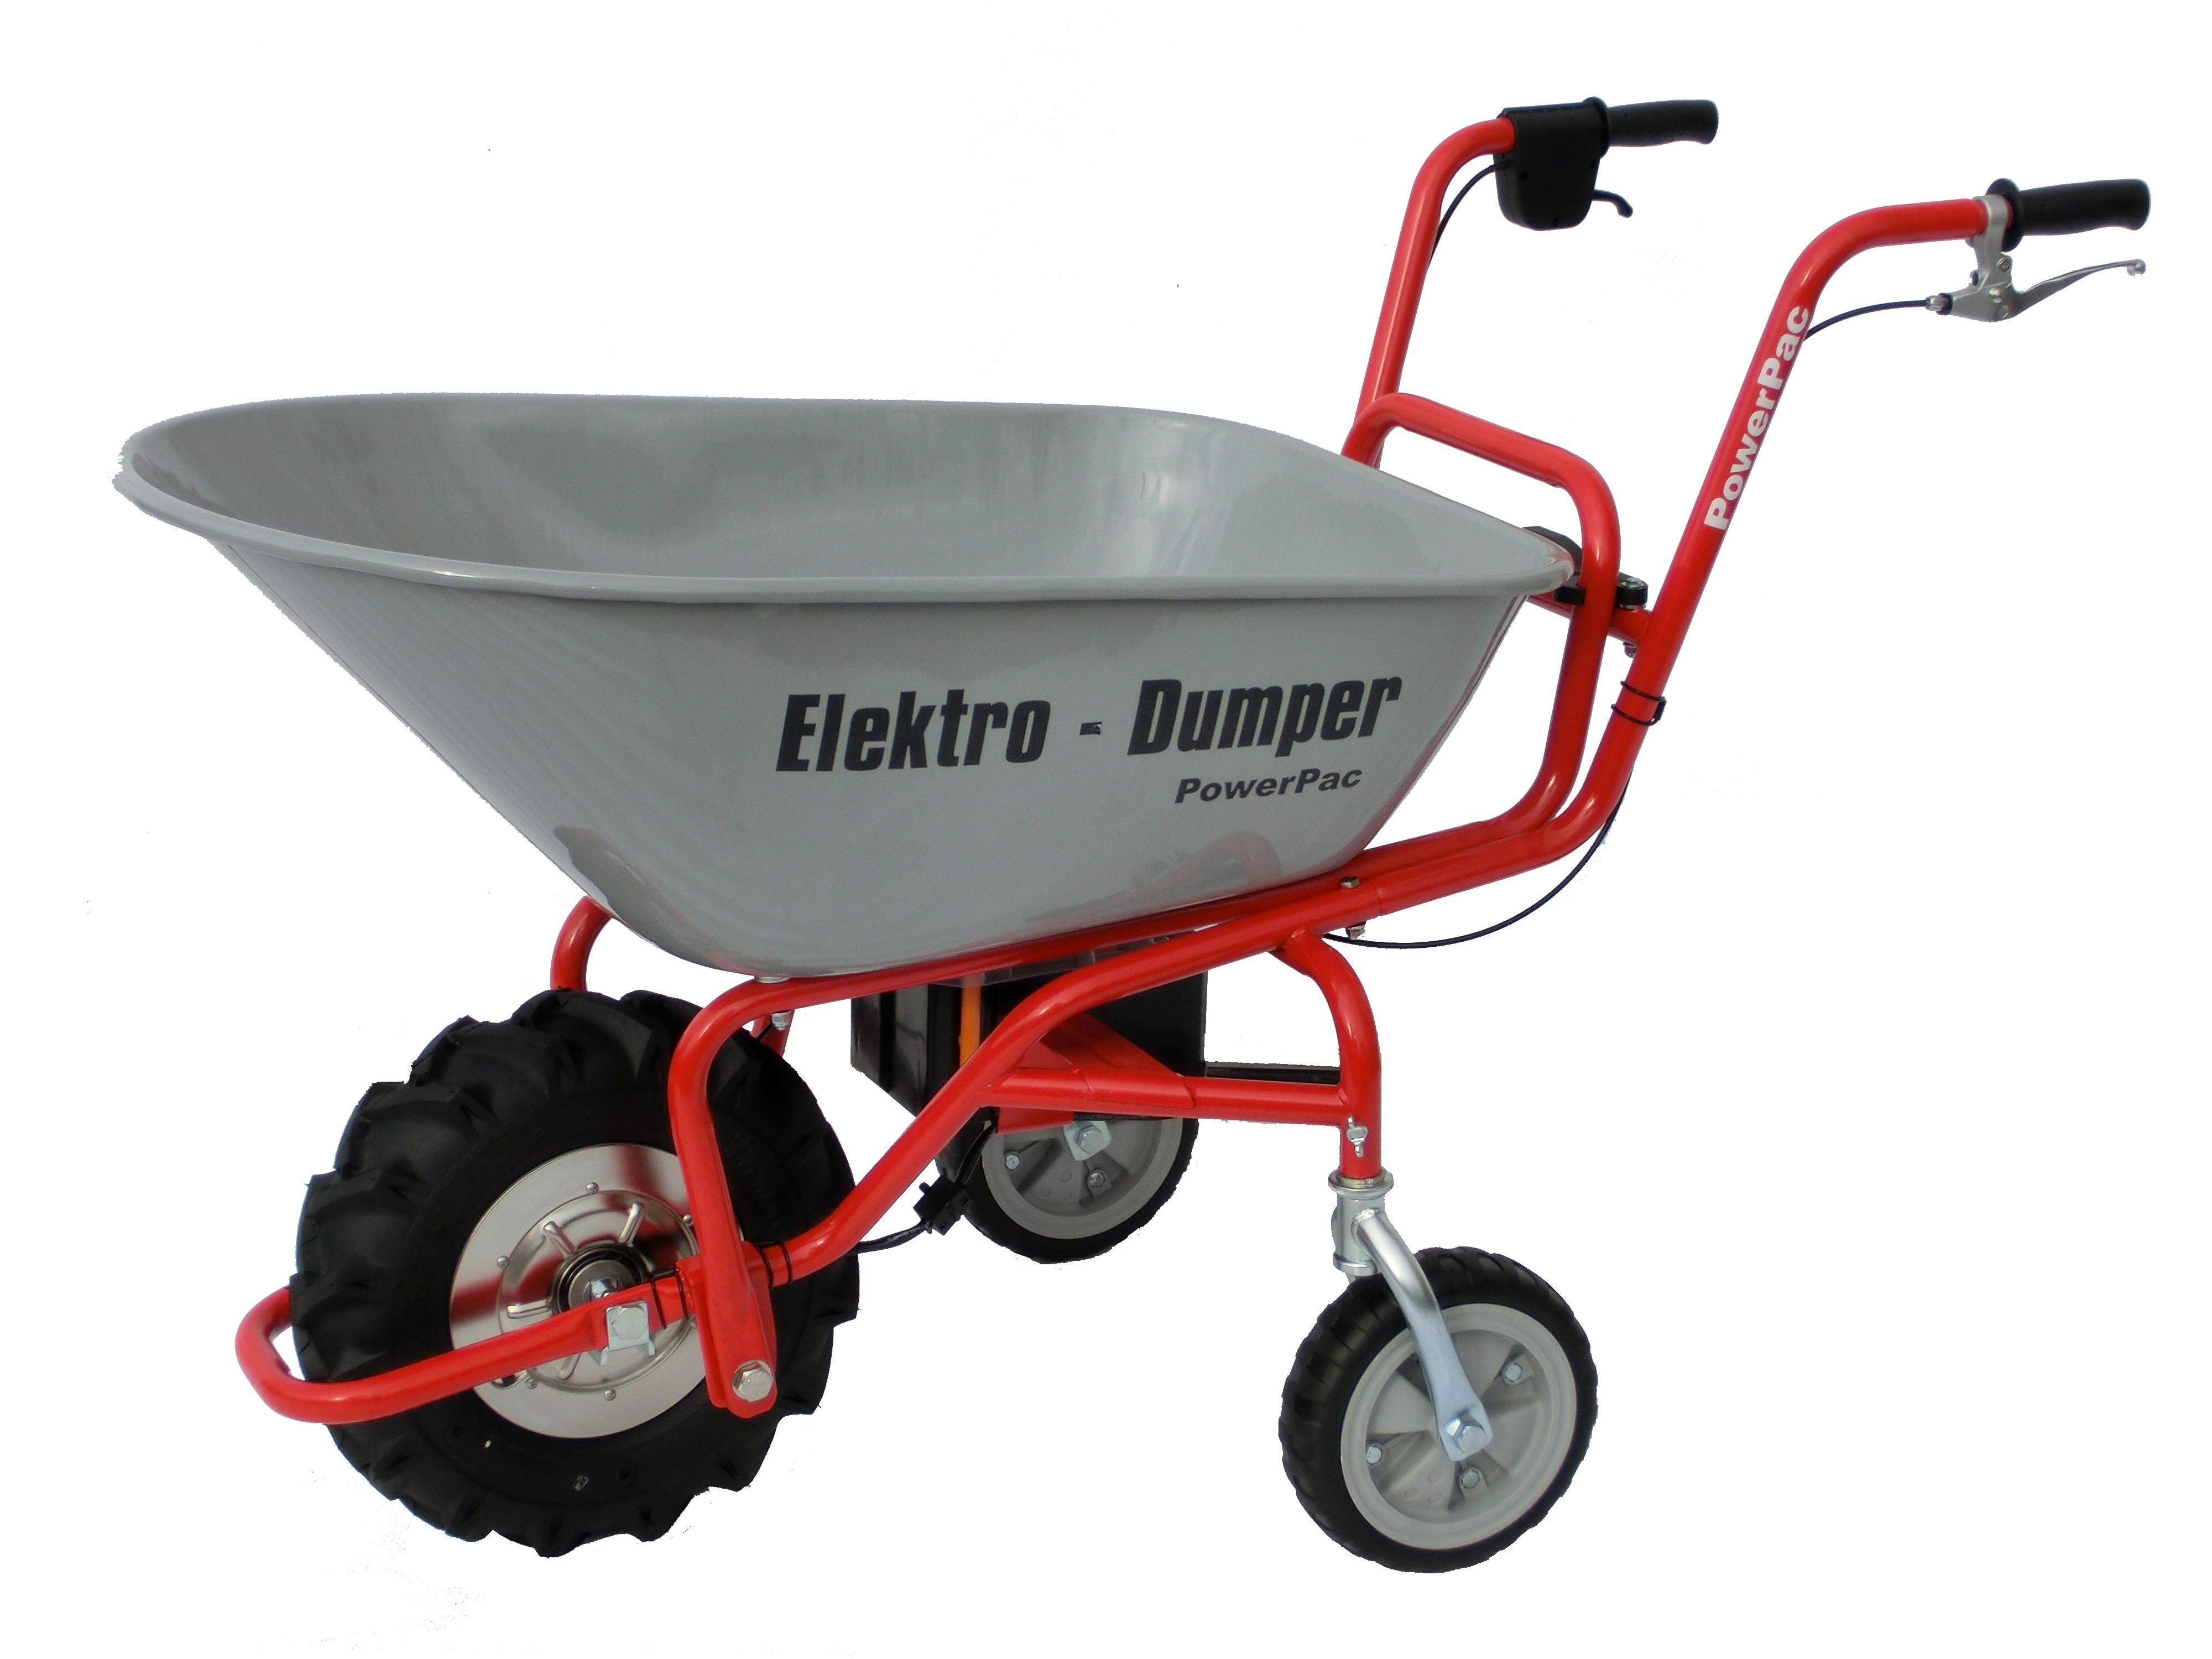 Powerpac Elektro-Dumper / Schubkarre Elektroantrieb ED120 unmontiert Bild 1